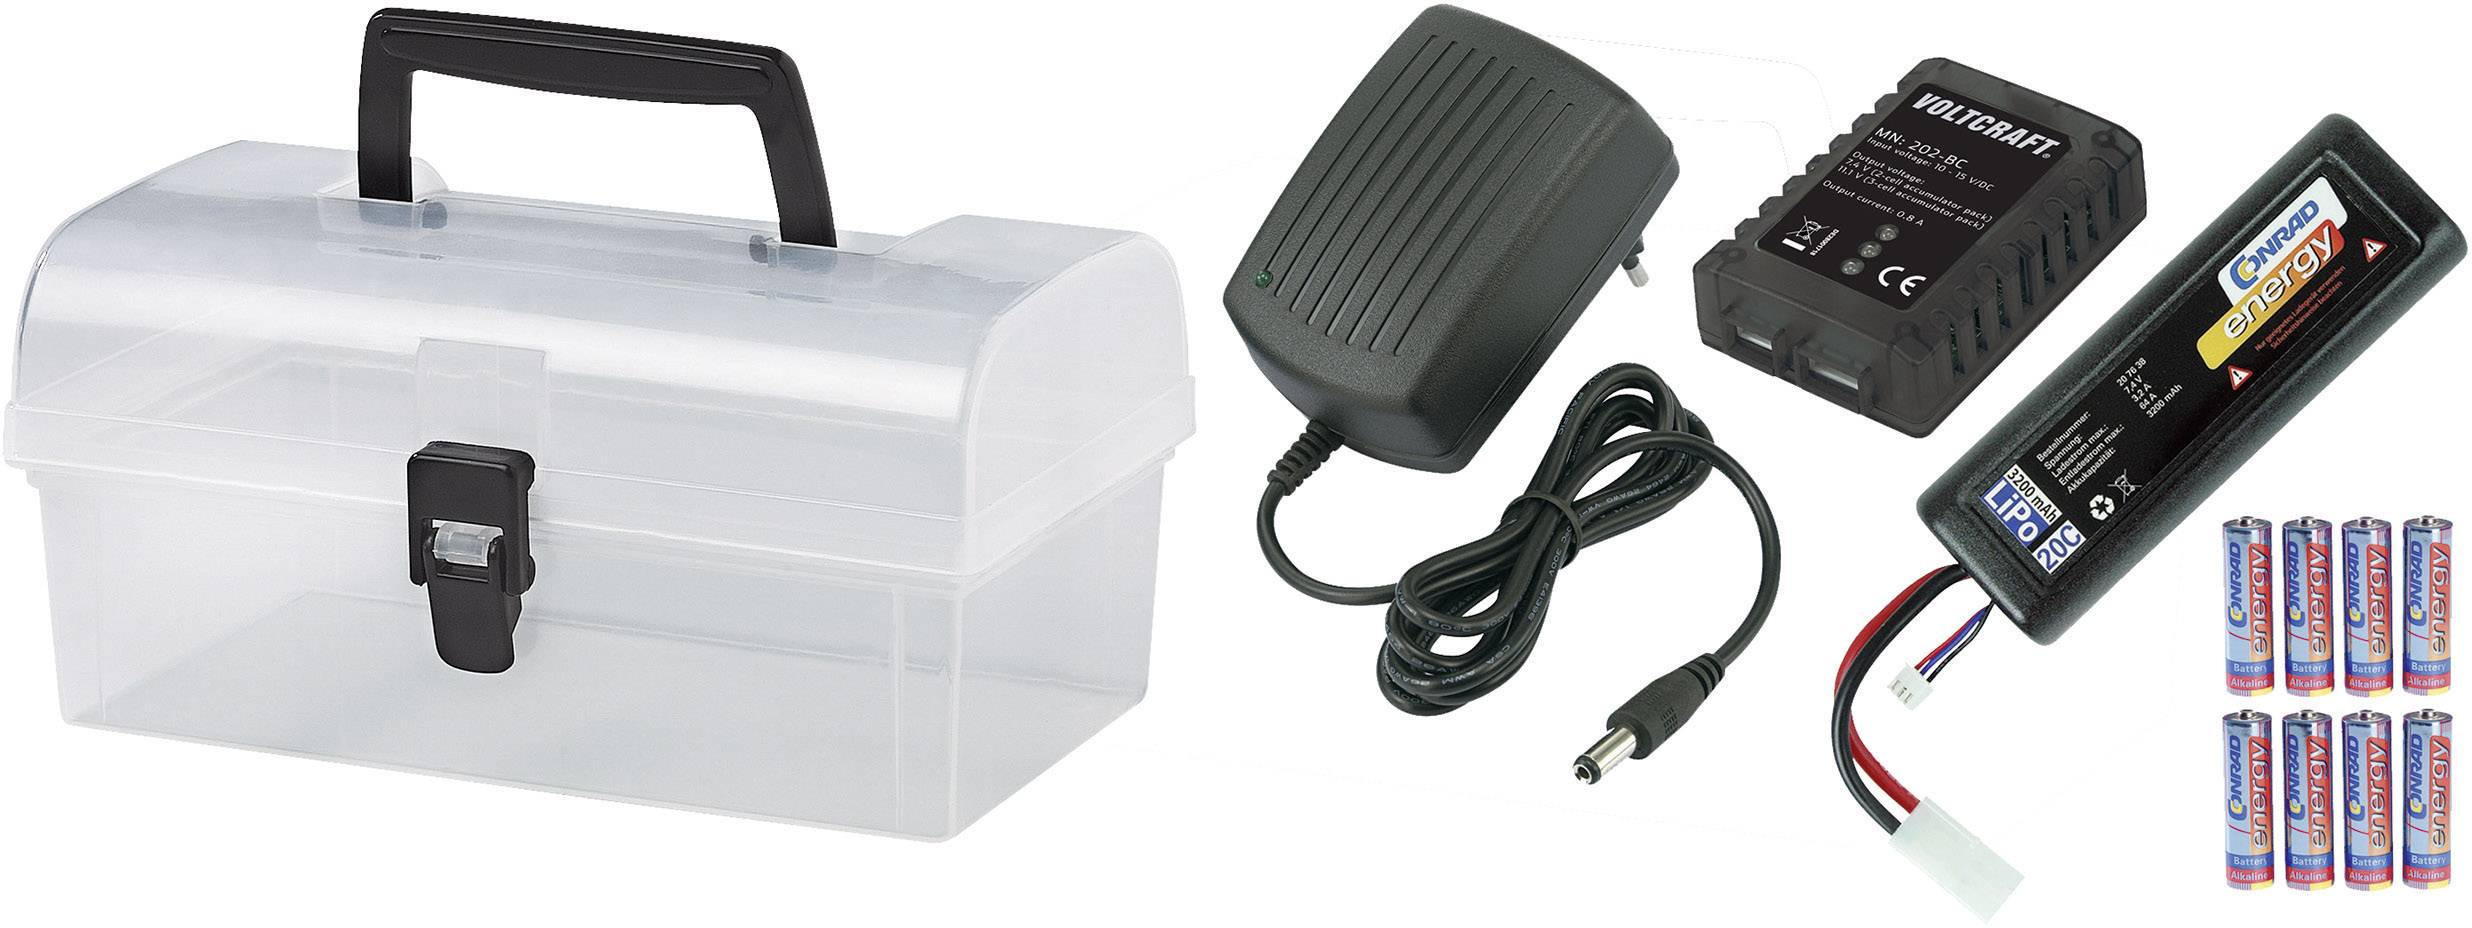 Tuningový kufrík s elektro dielmi pre brushless motory, Reely 205530